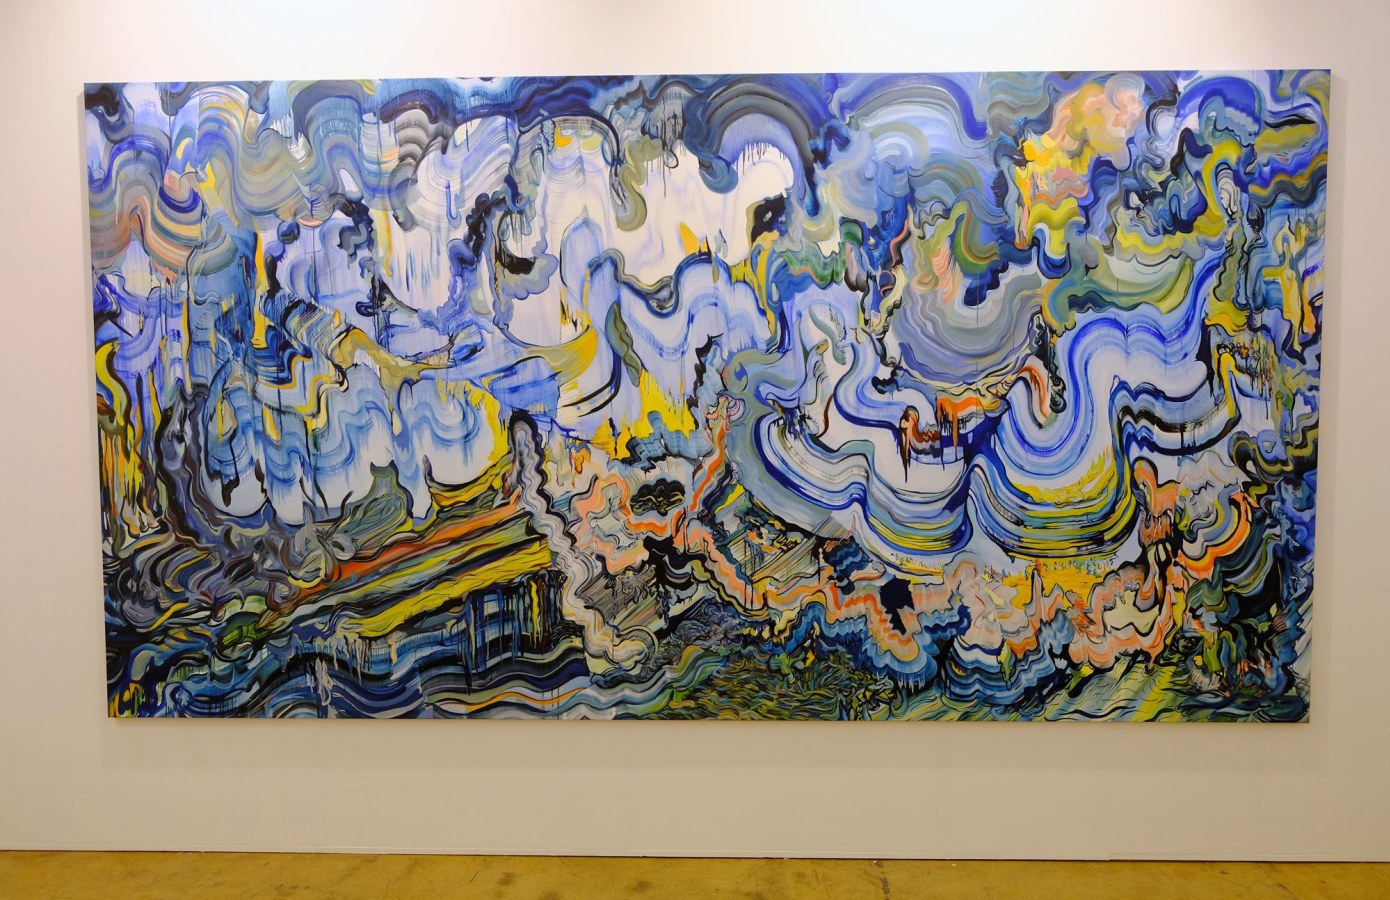 Art Rotterdam 2019, Diana Roig, Ulla-Stina Wikander,